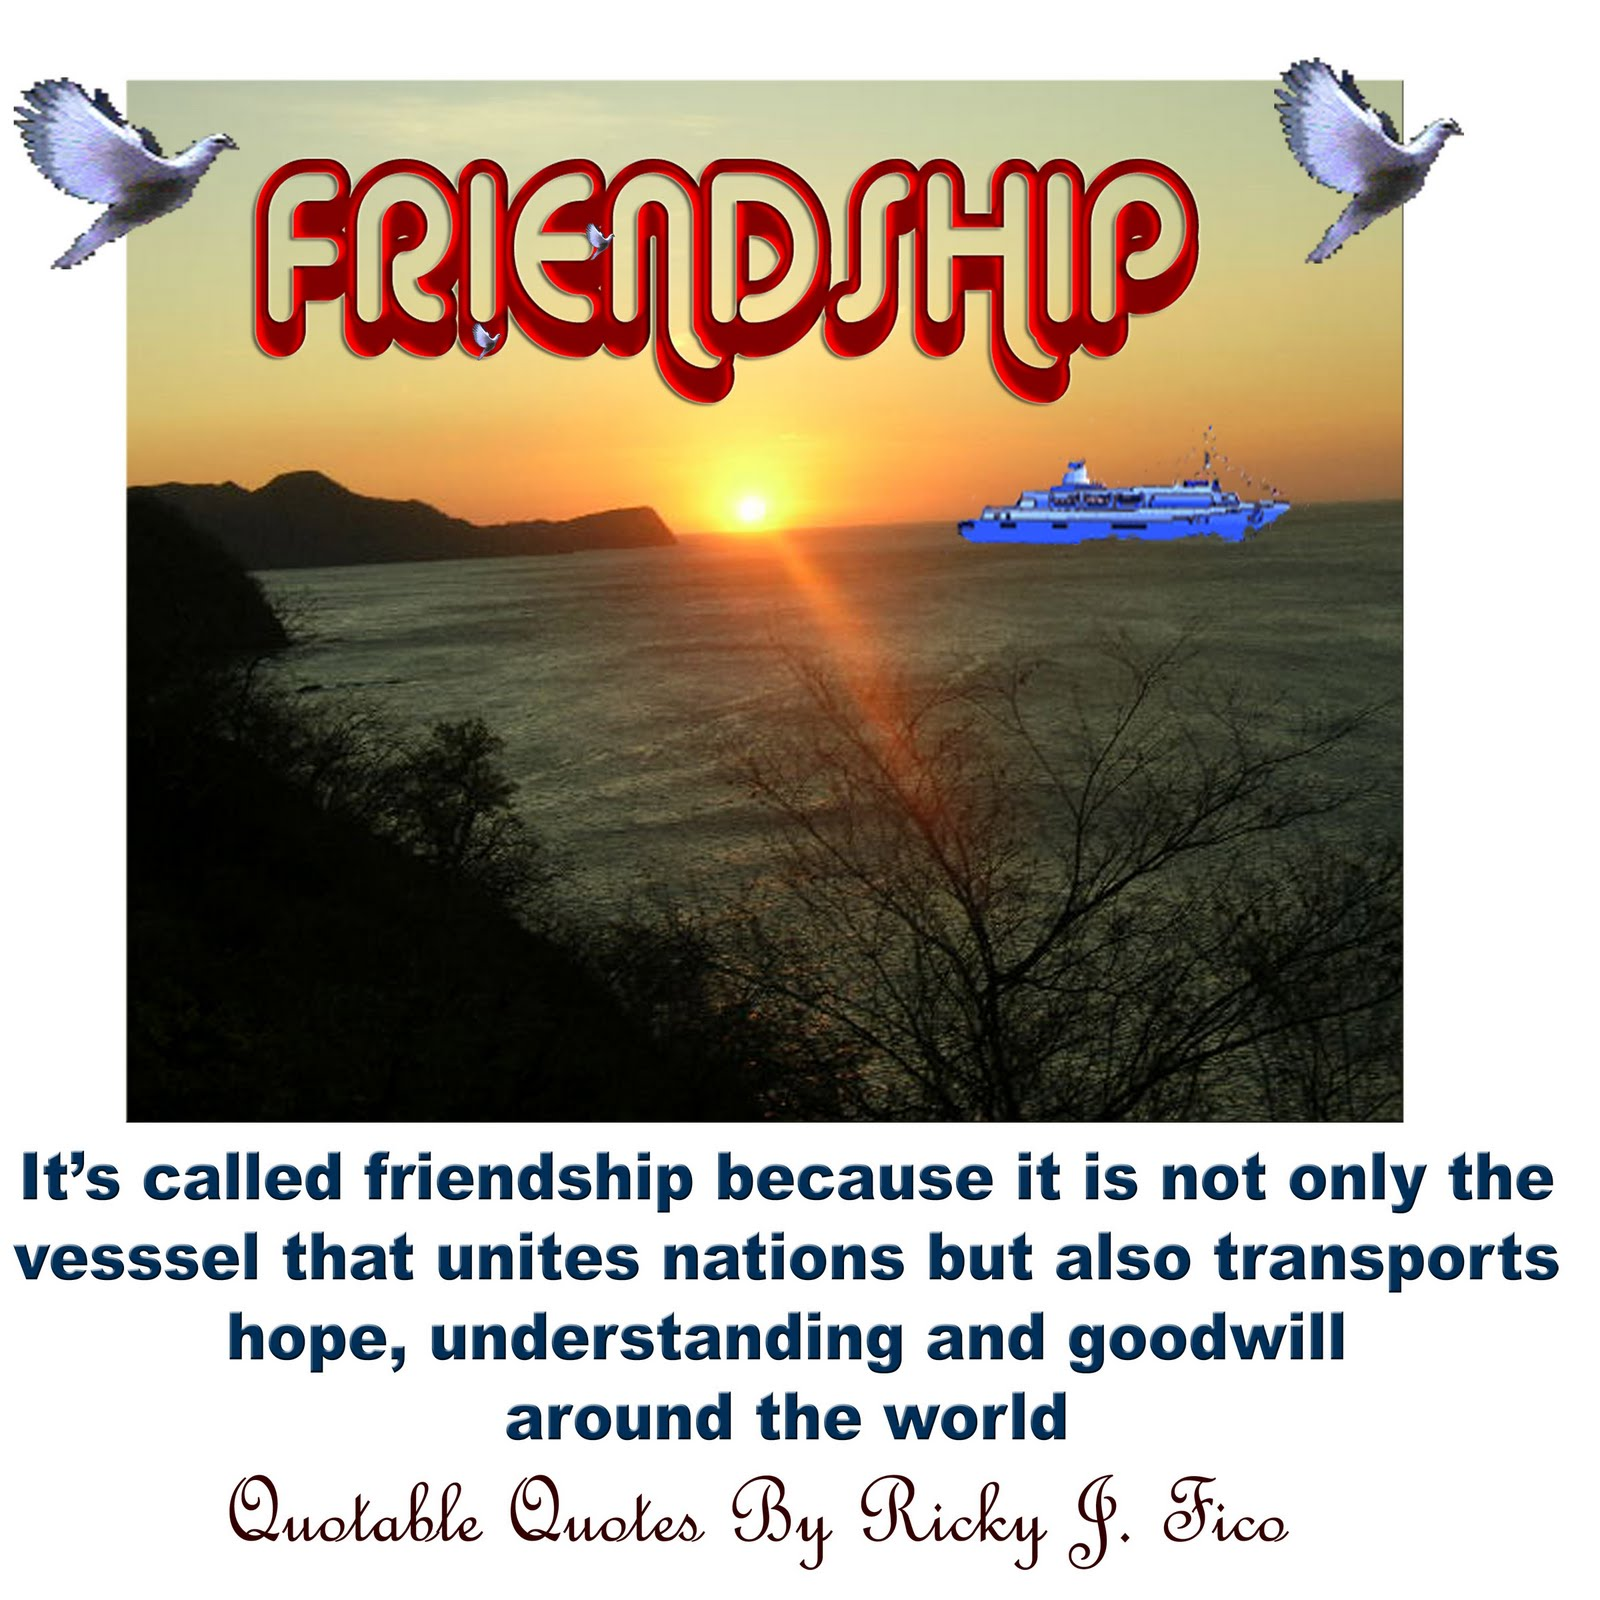 Friendship Greatness: Friendship Is Great